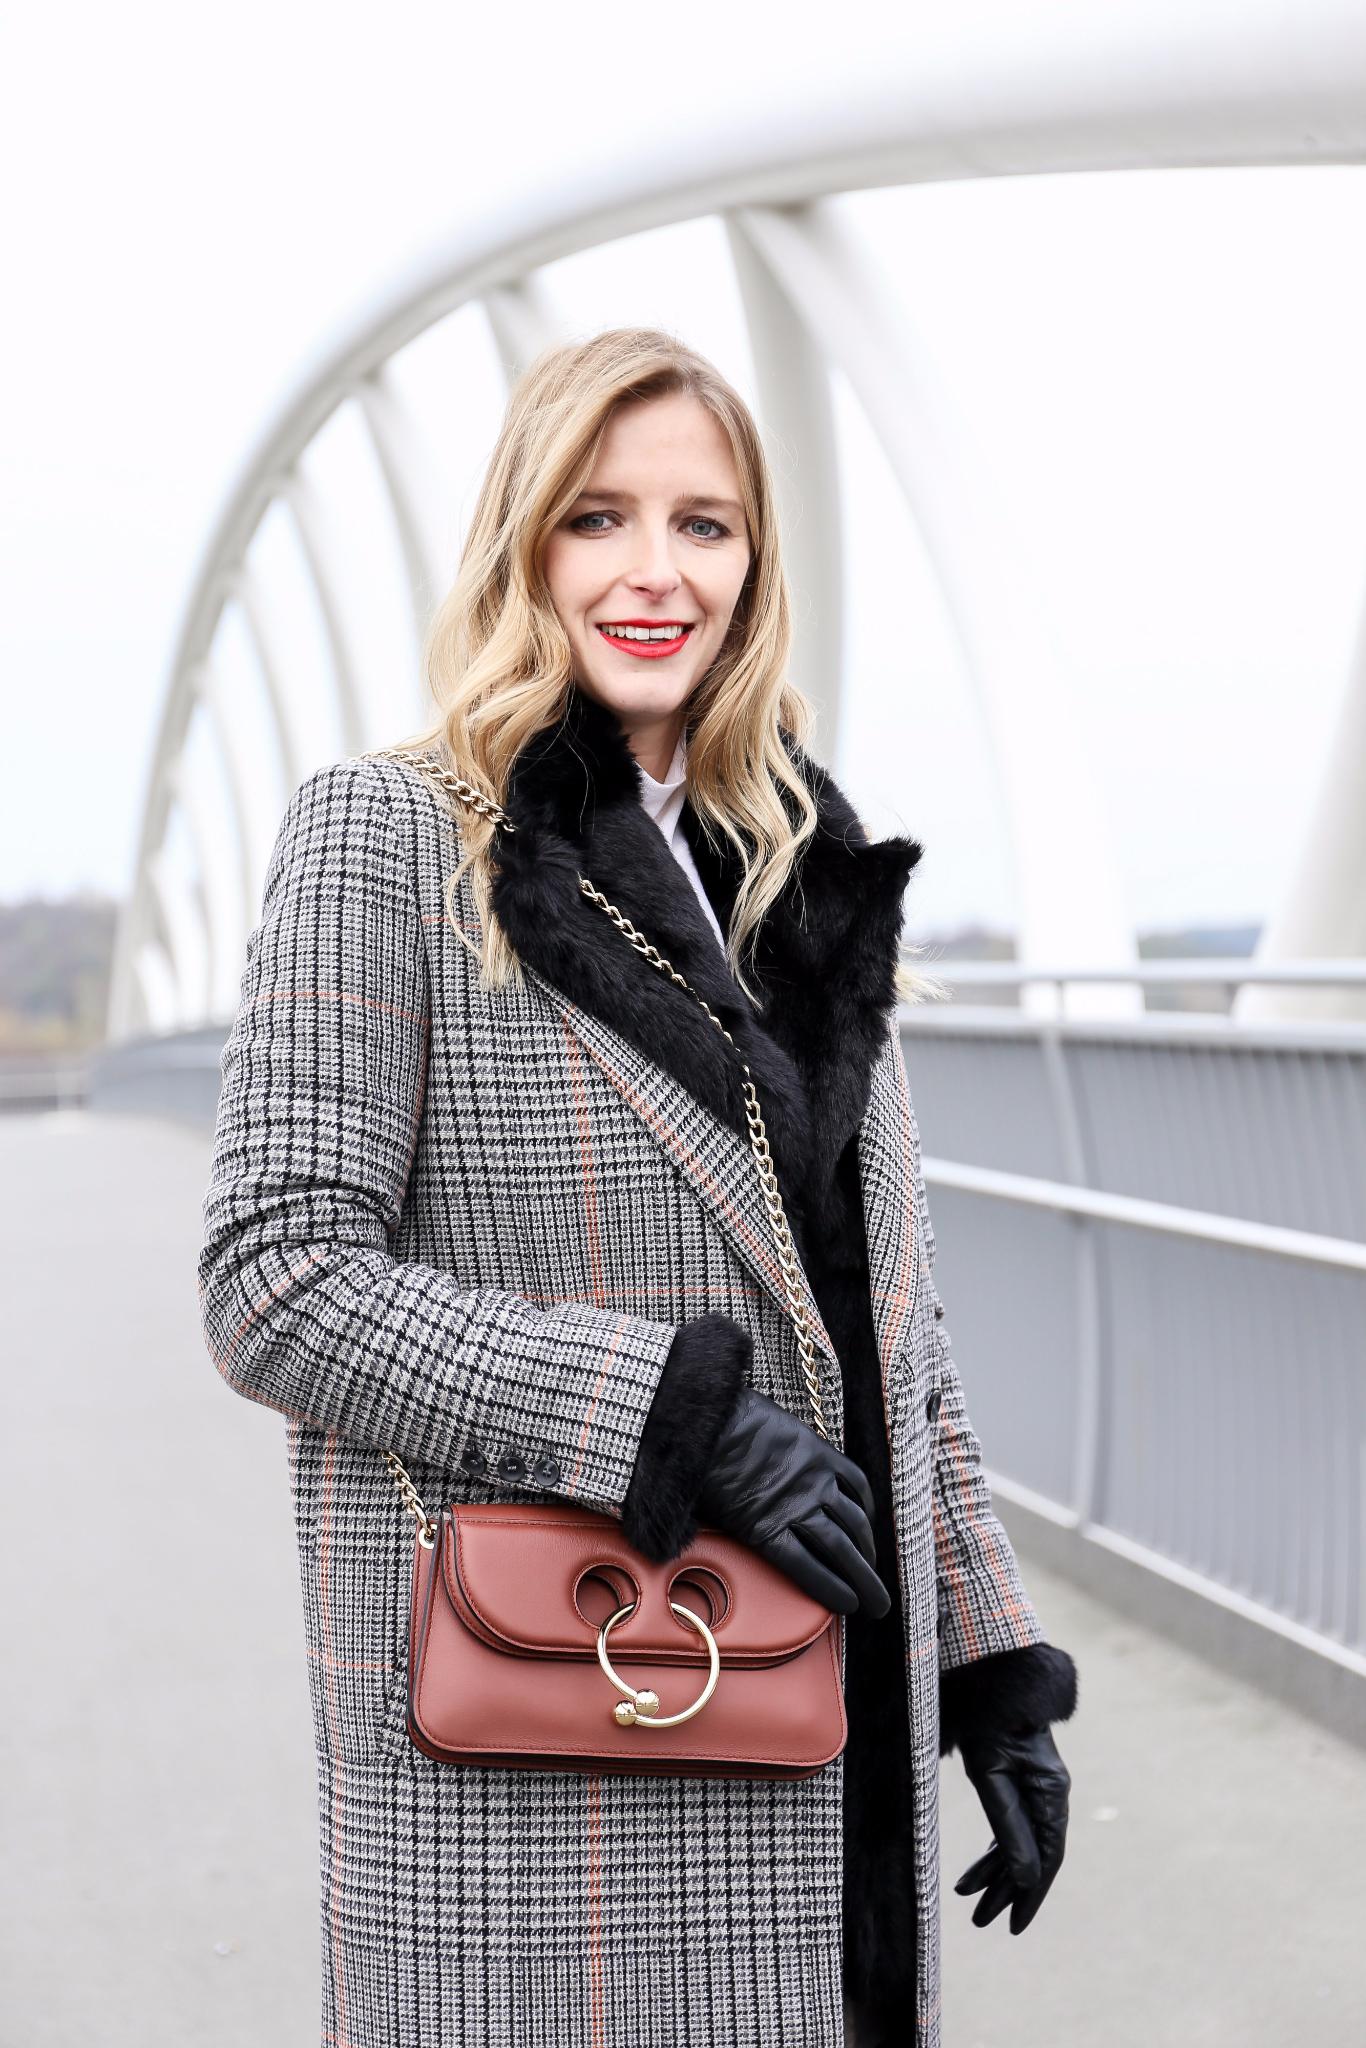 MOD-by-Monique-Fashion-Looks-JWAnderson-meets-Glencheck-21